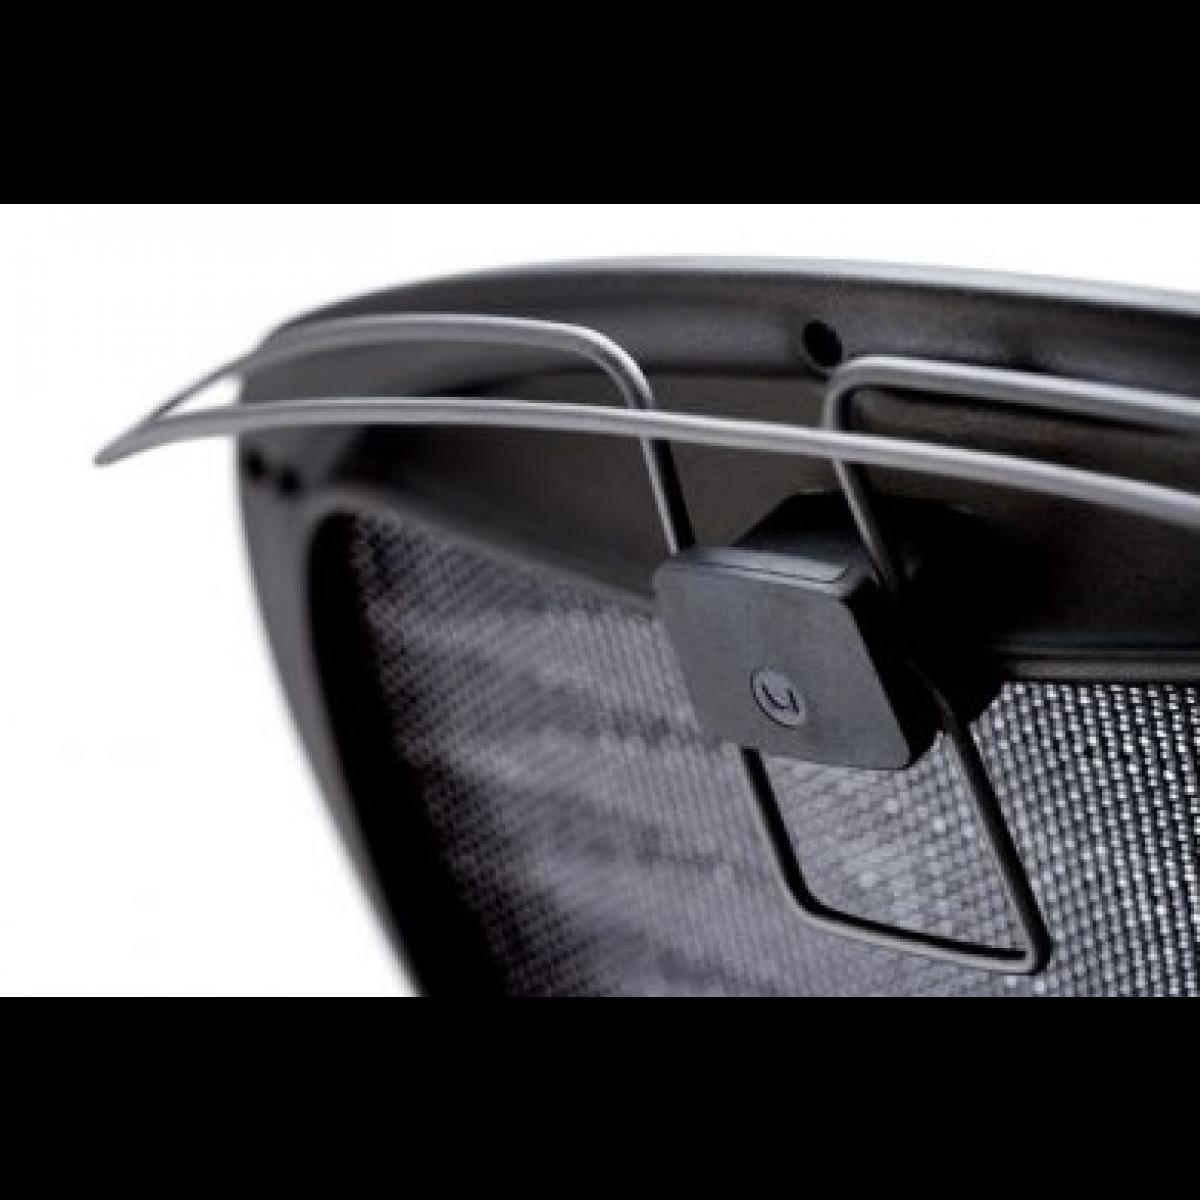 Aeron Chair Parts Uk Furniture Aeron Chair Repair Herman